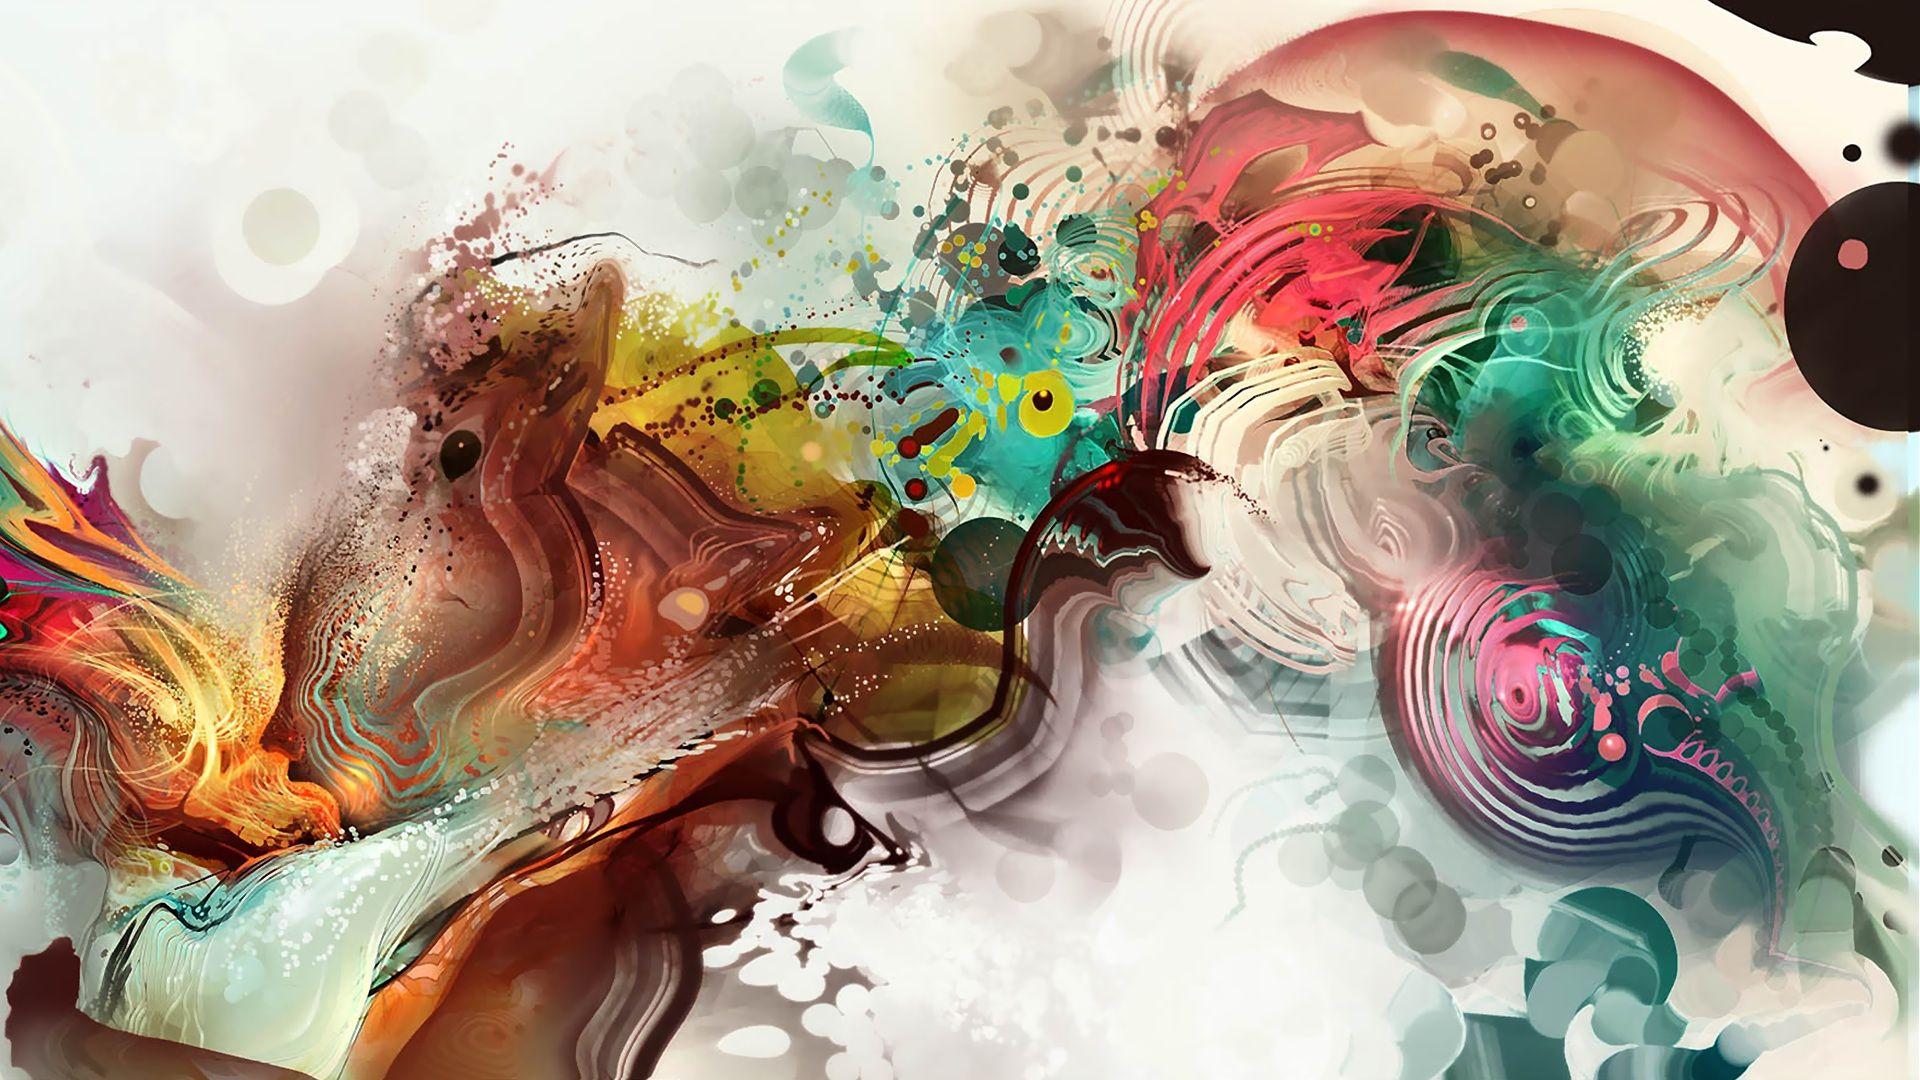 Artistic Abstract Wallpaper Full HD #m0d 1920x1080 px 592.78.